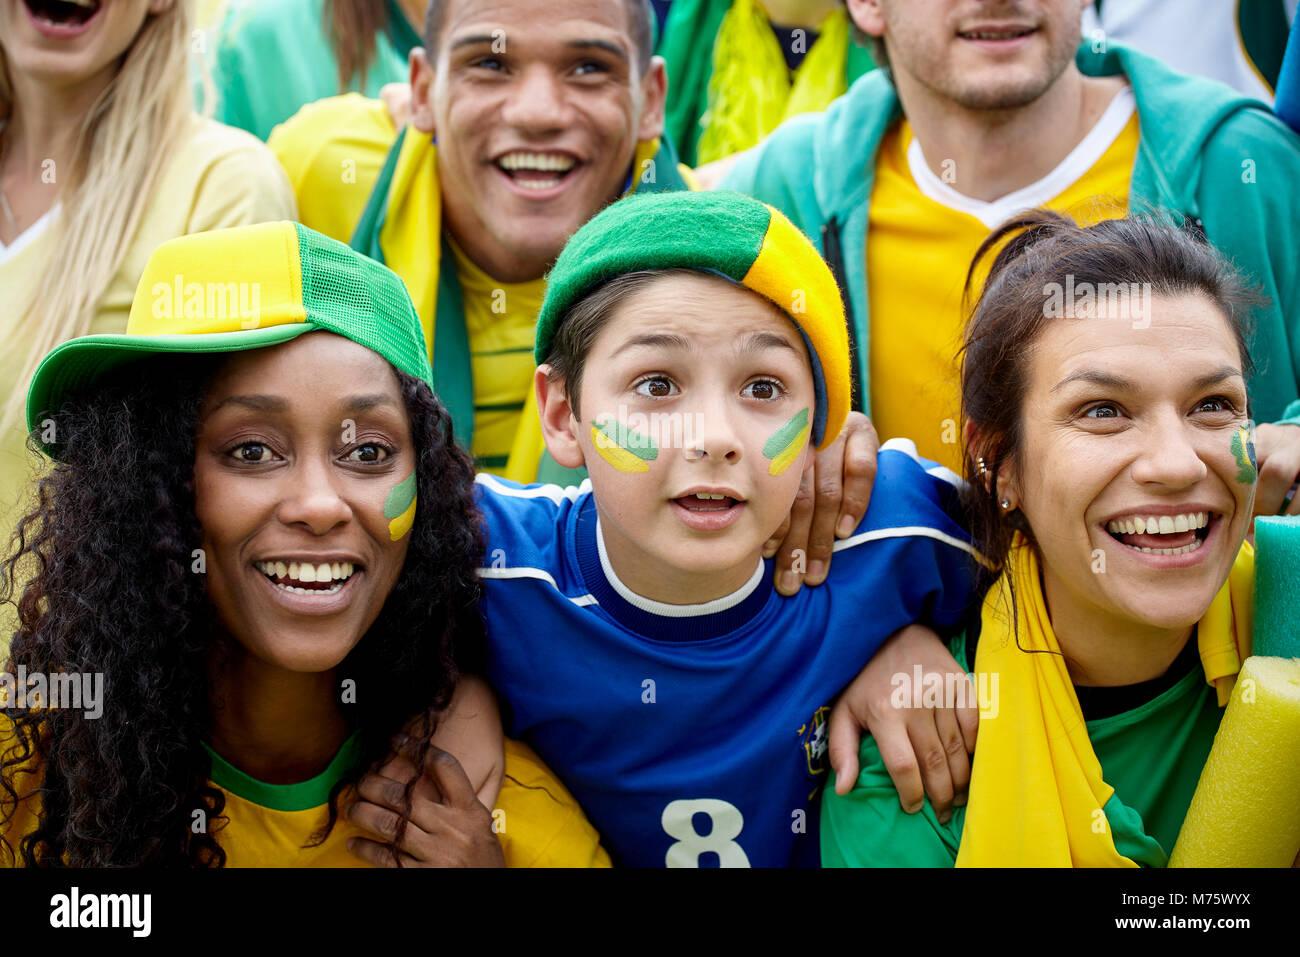 Brasilianischen Fußball-Fans, Fußball Match Stockbild